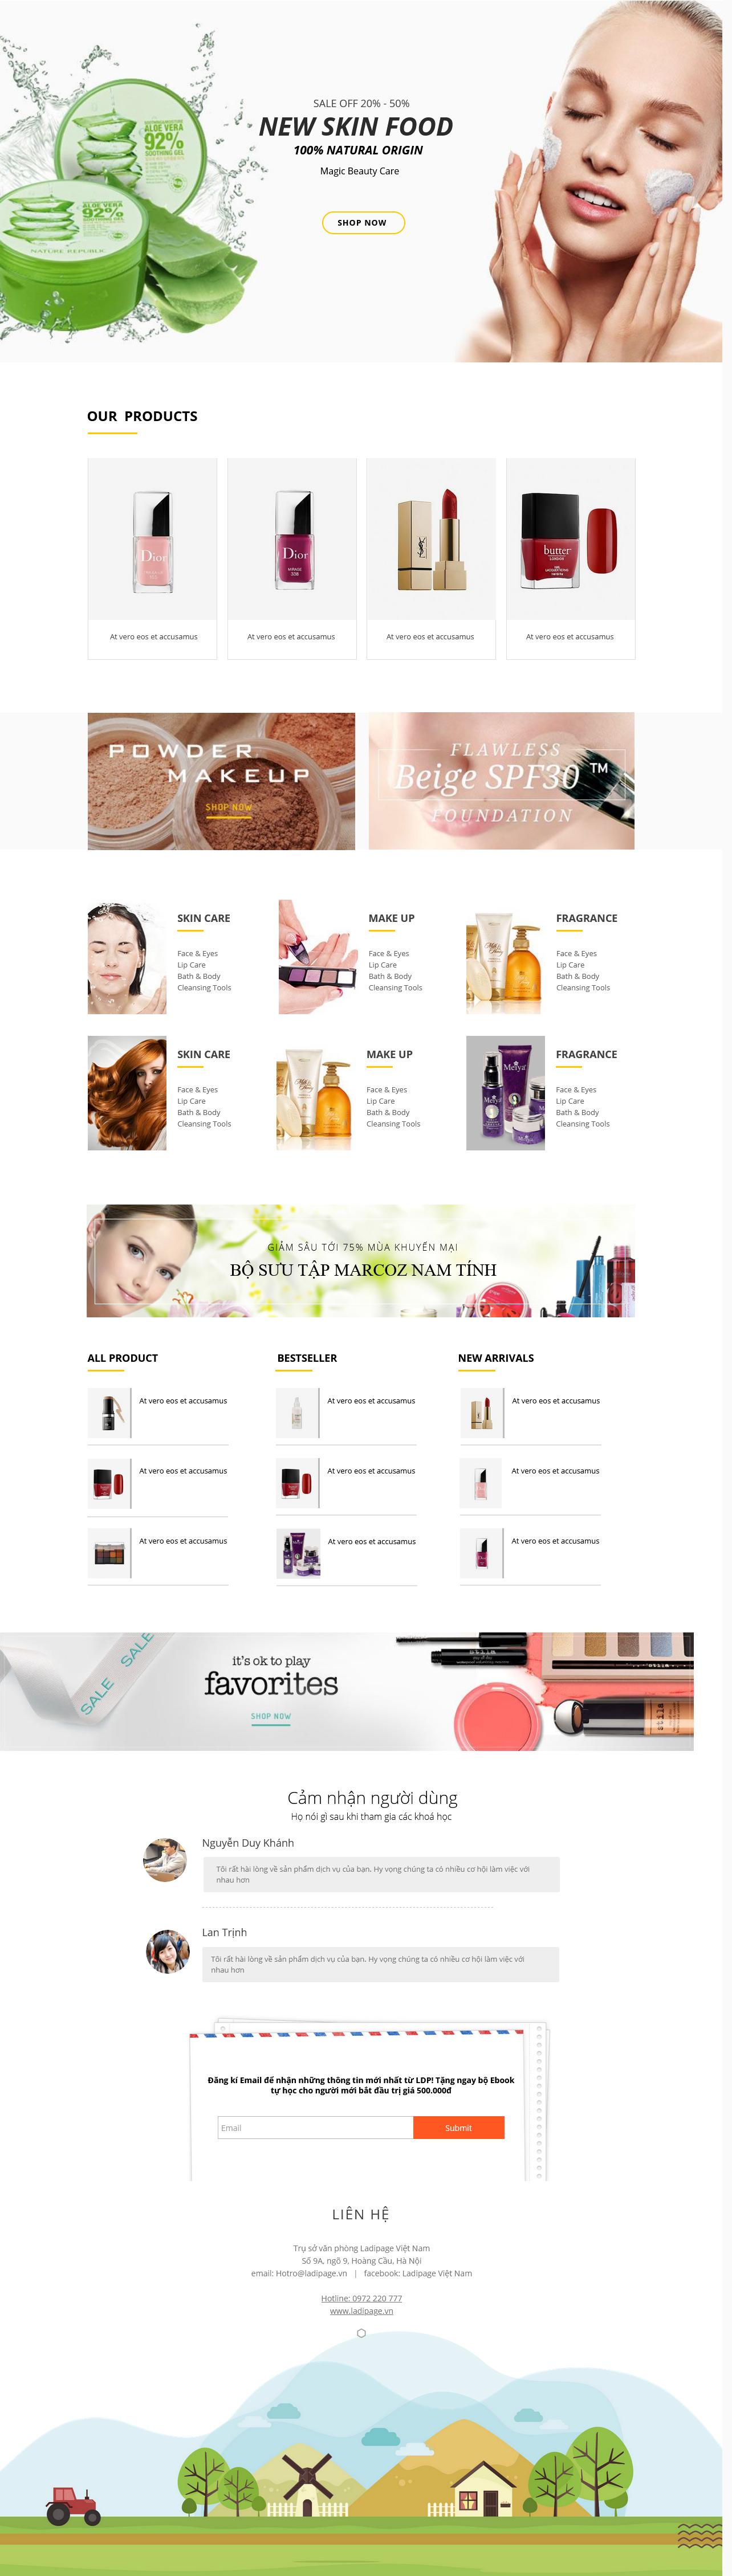 Thiết kế website Thiết kế webiste landingpage tham-my---spa---lam-dep Sức Khỏe Làm đẹp 15